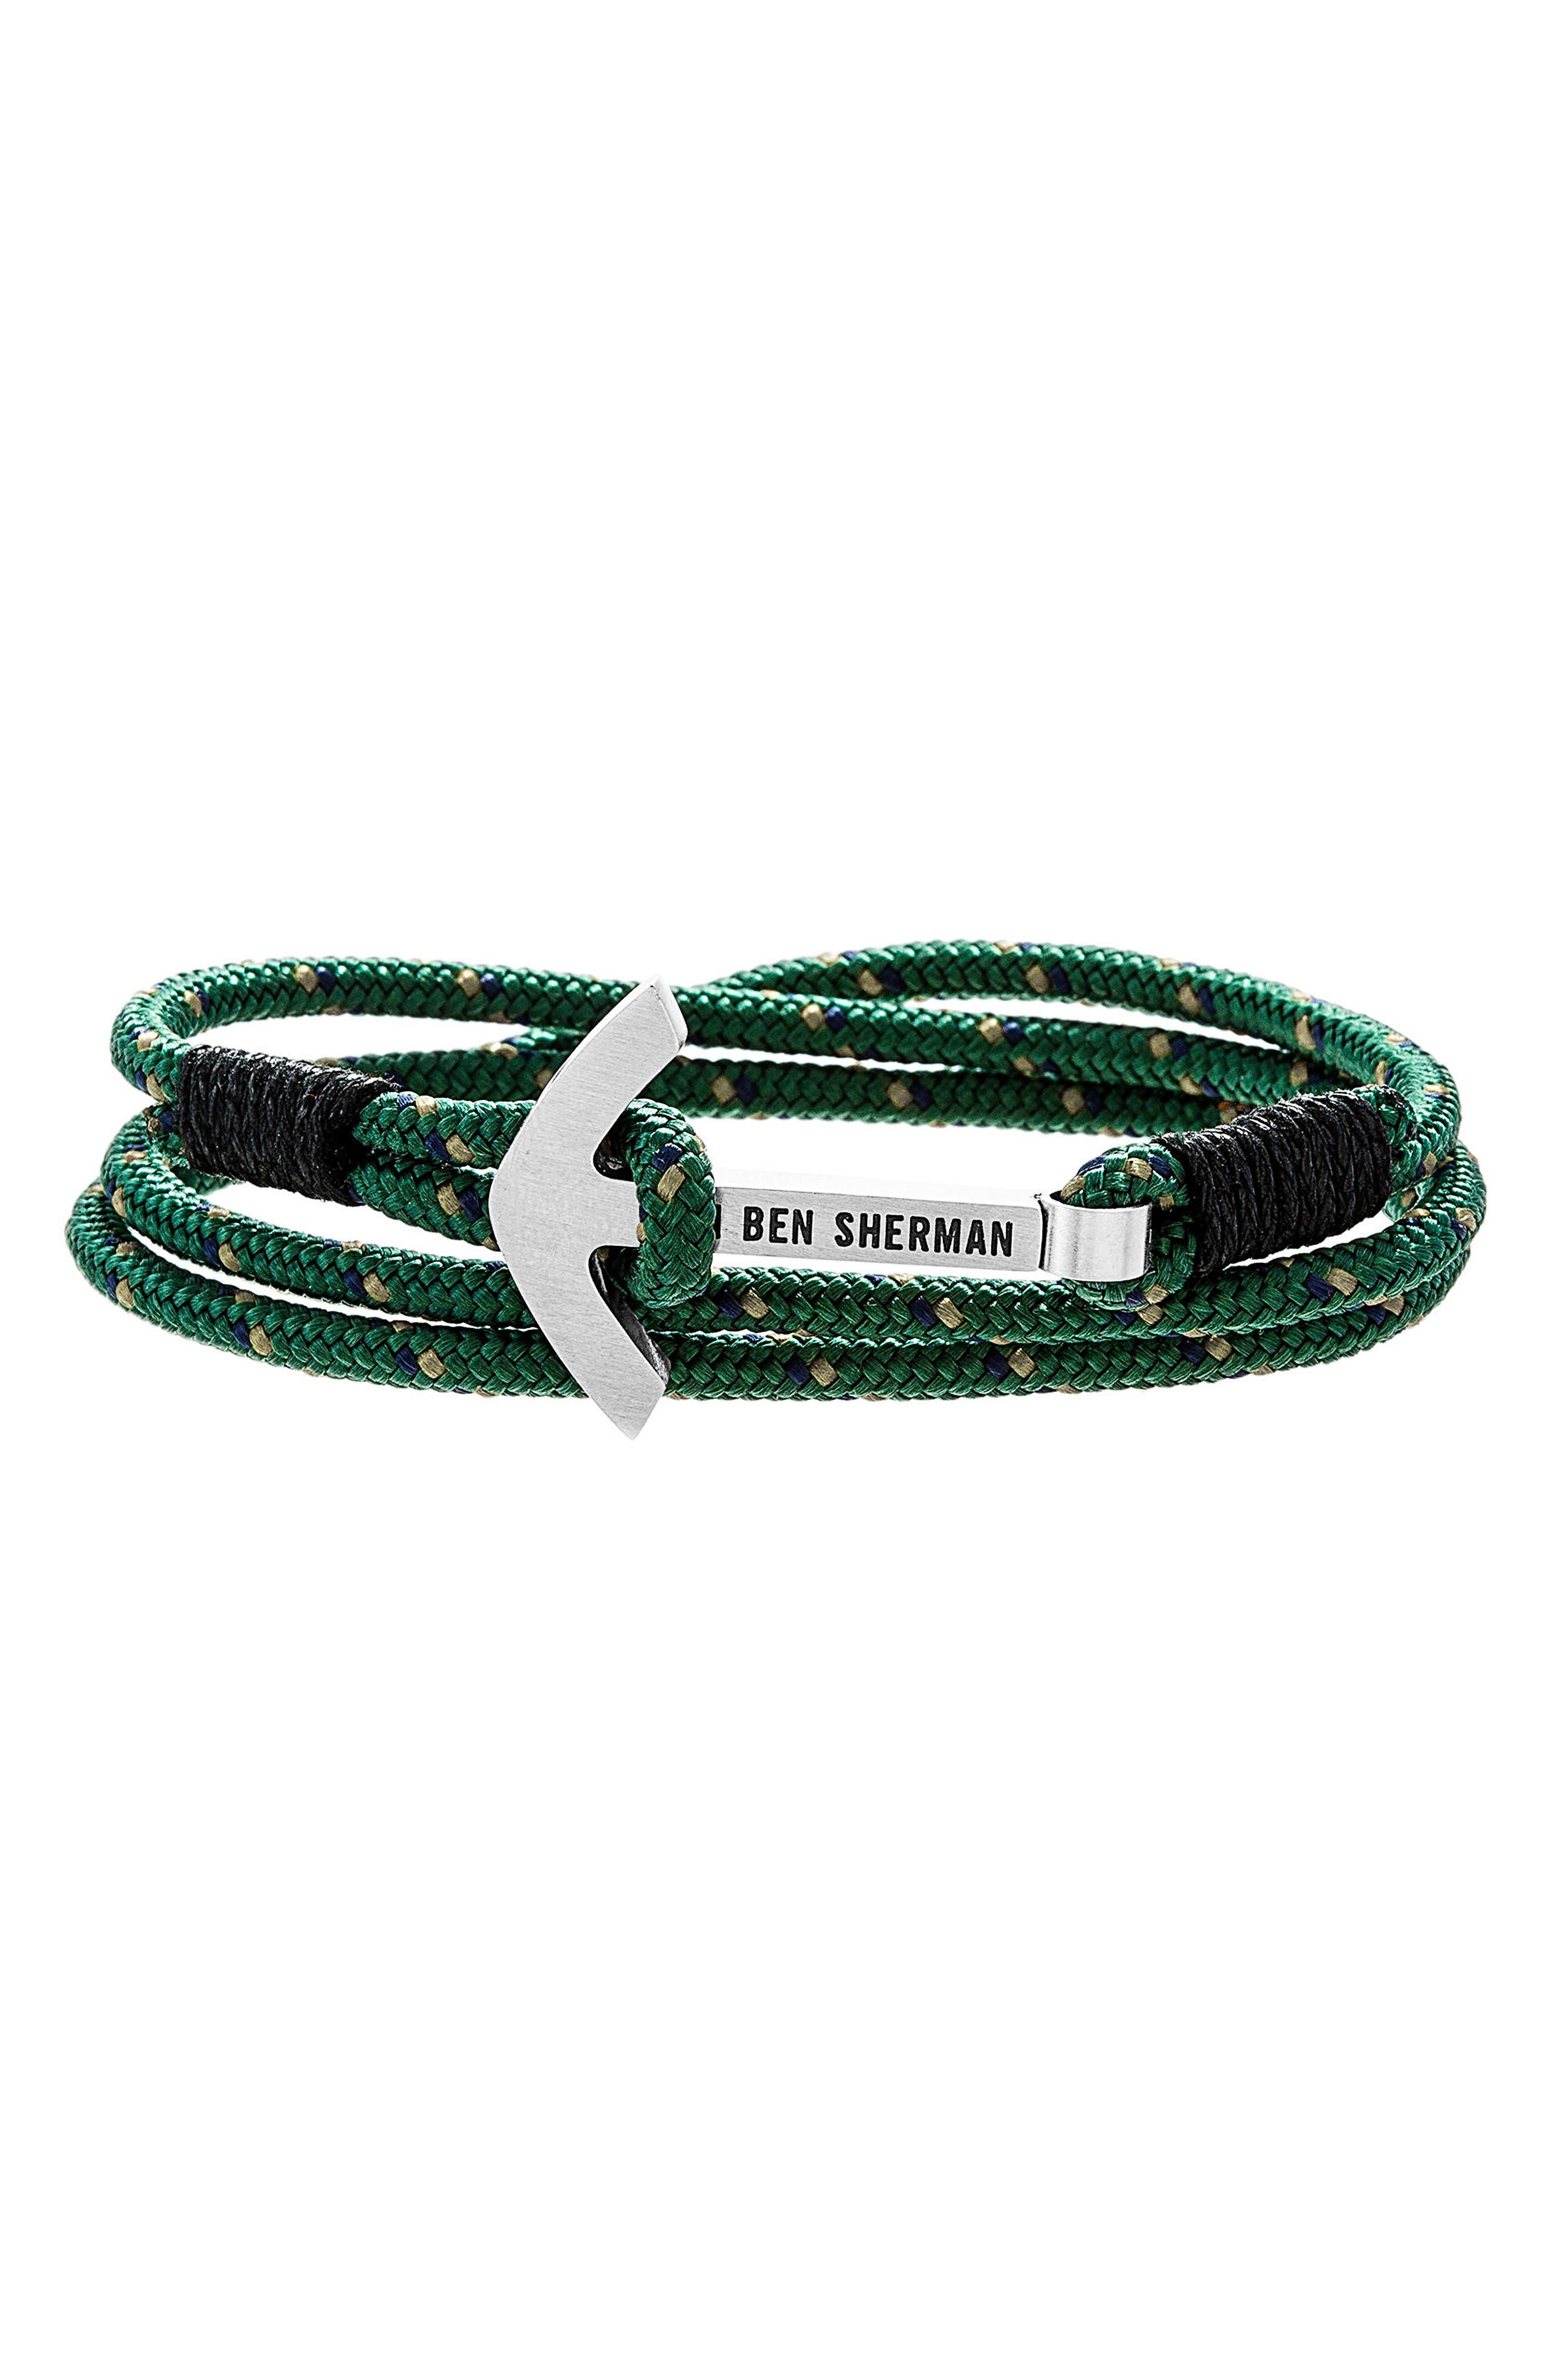 Anchor Braided Cord Bracelet,                             Main thumbnail 1, color,                             BLACK/ GREEN/ SILVER